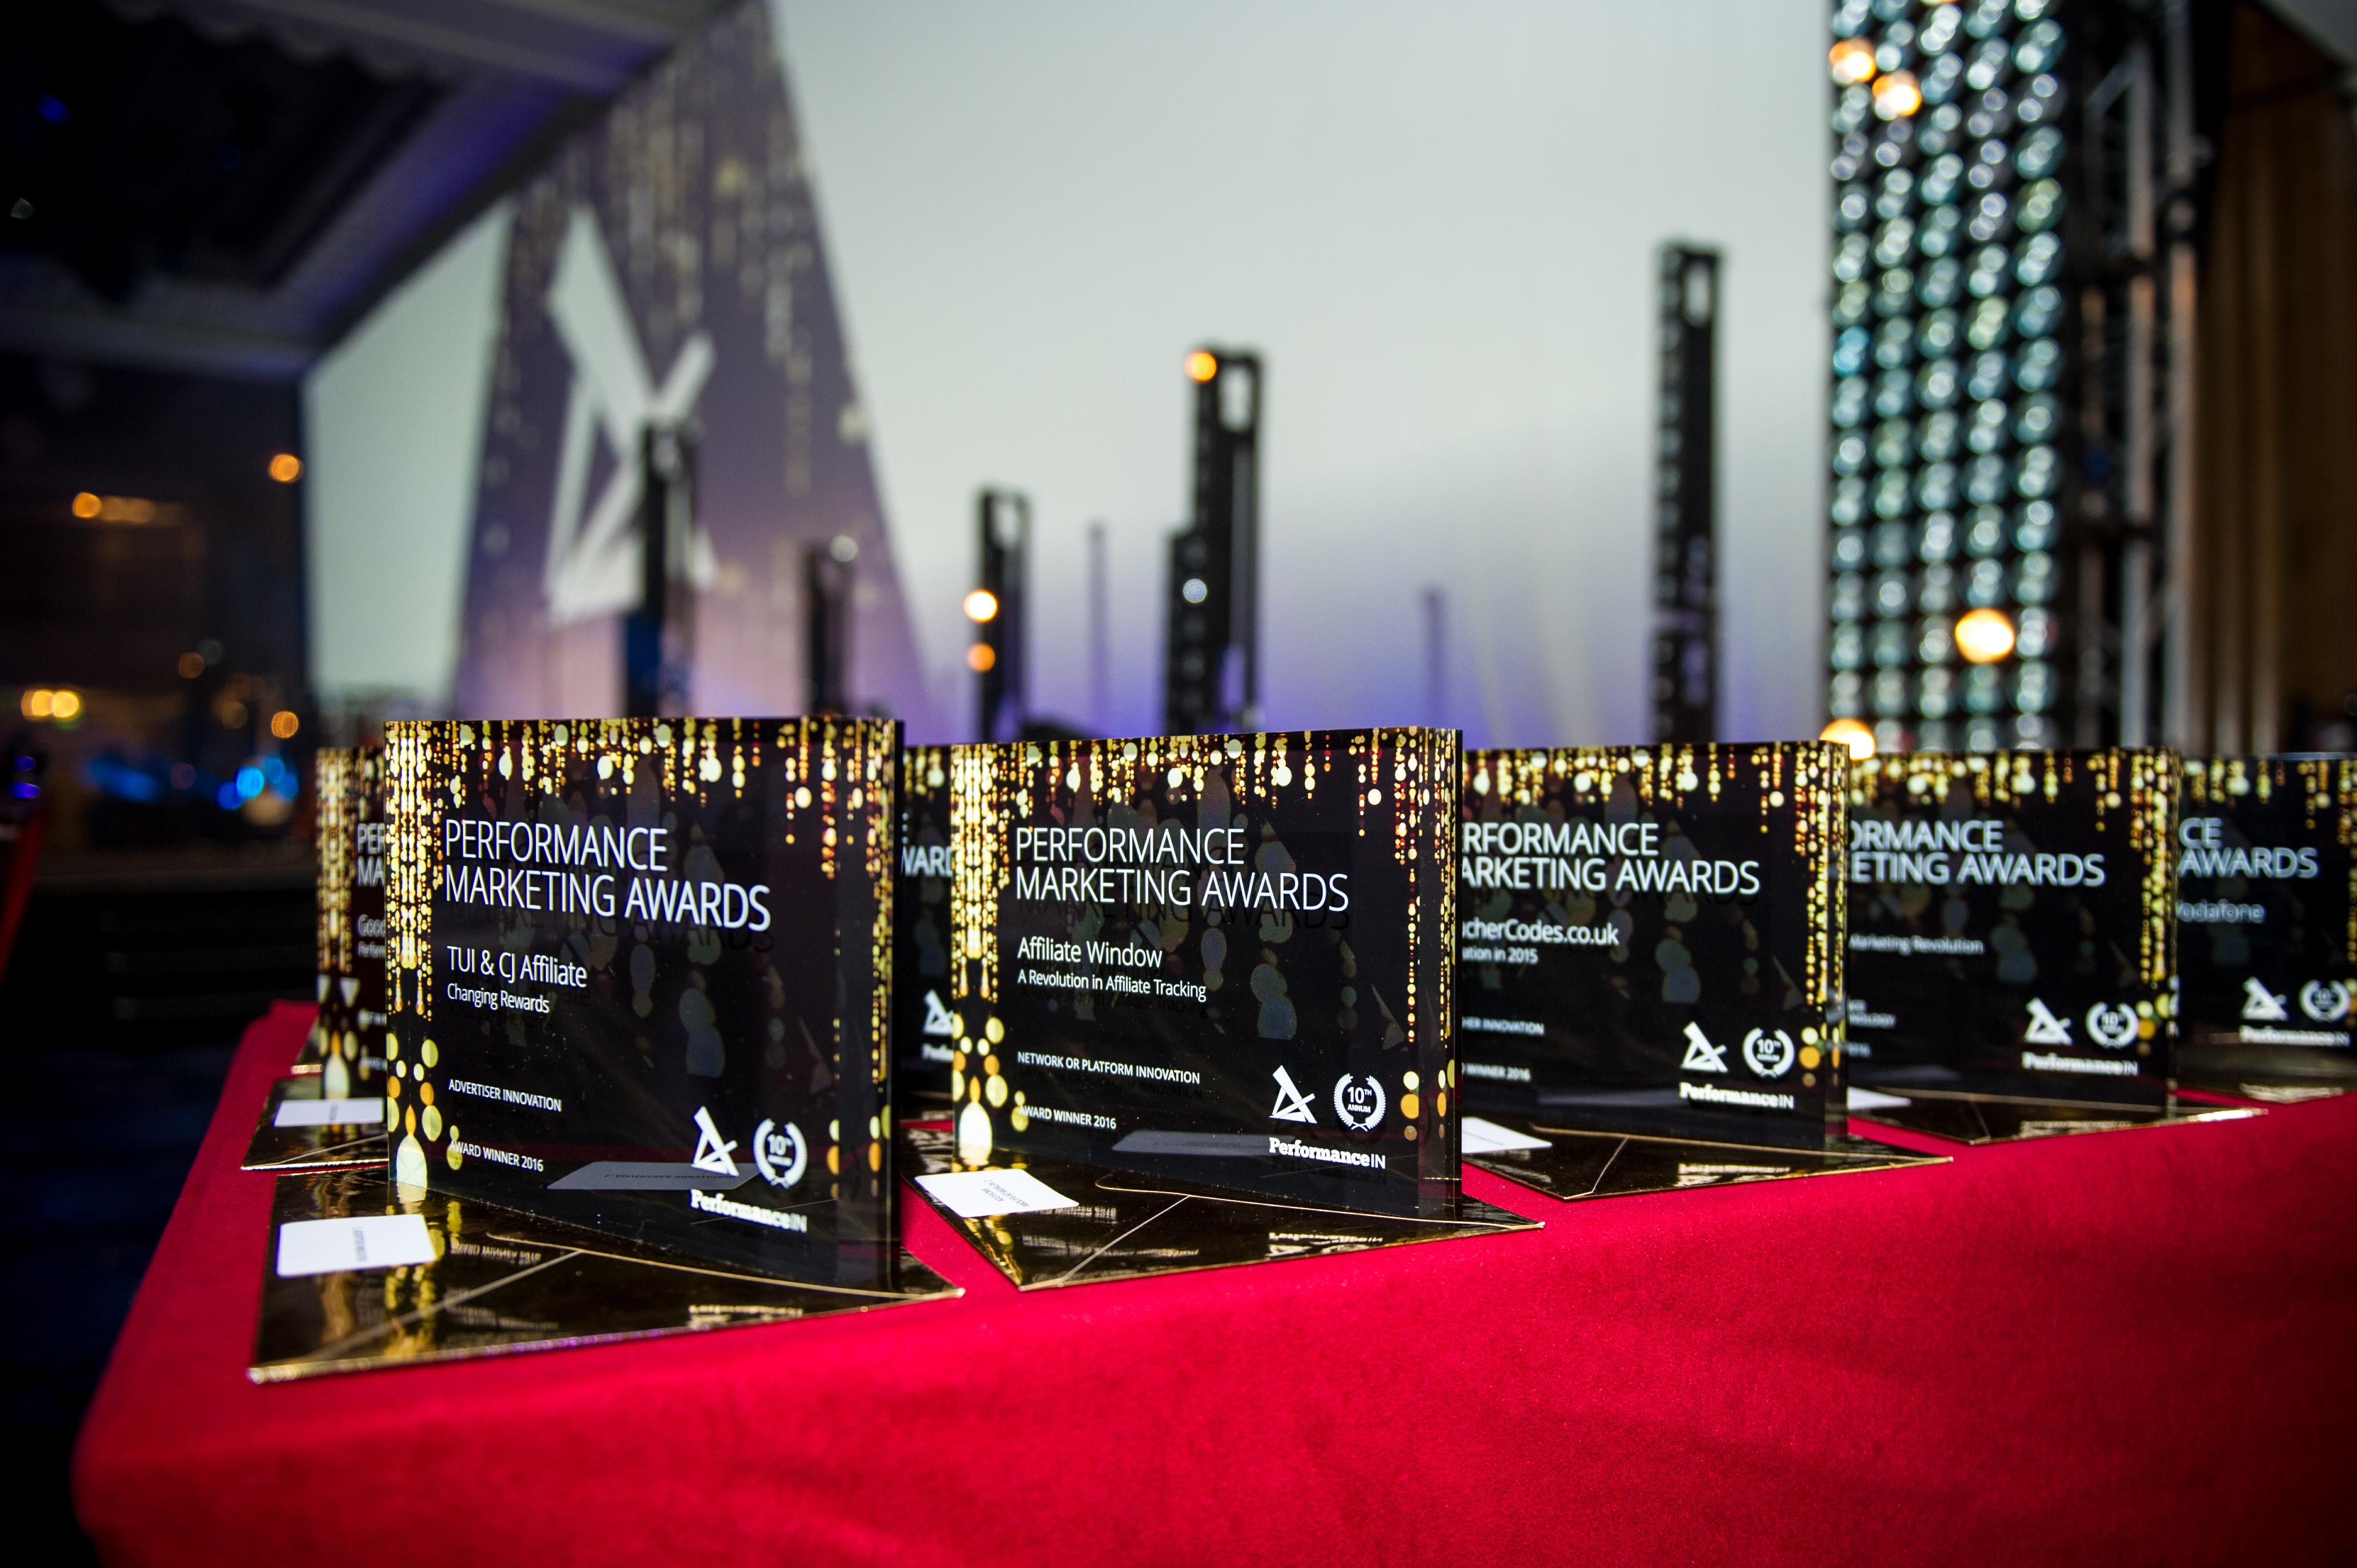 European Performance Marketing Awards 2016 – shortlist.